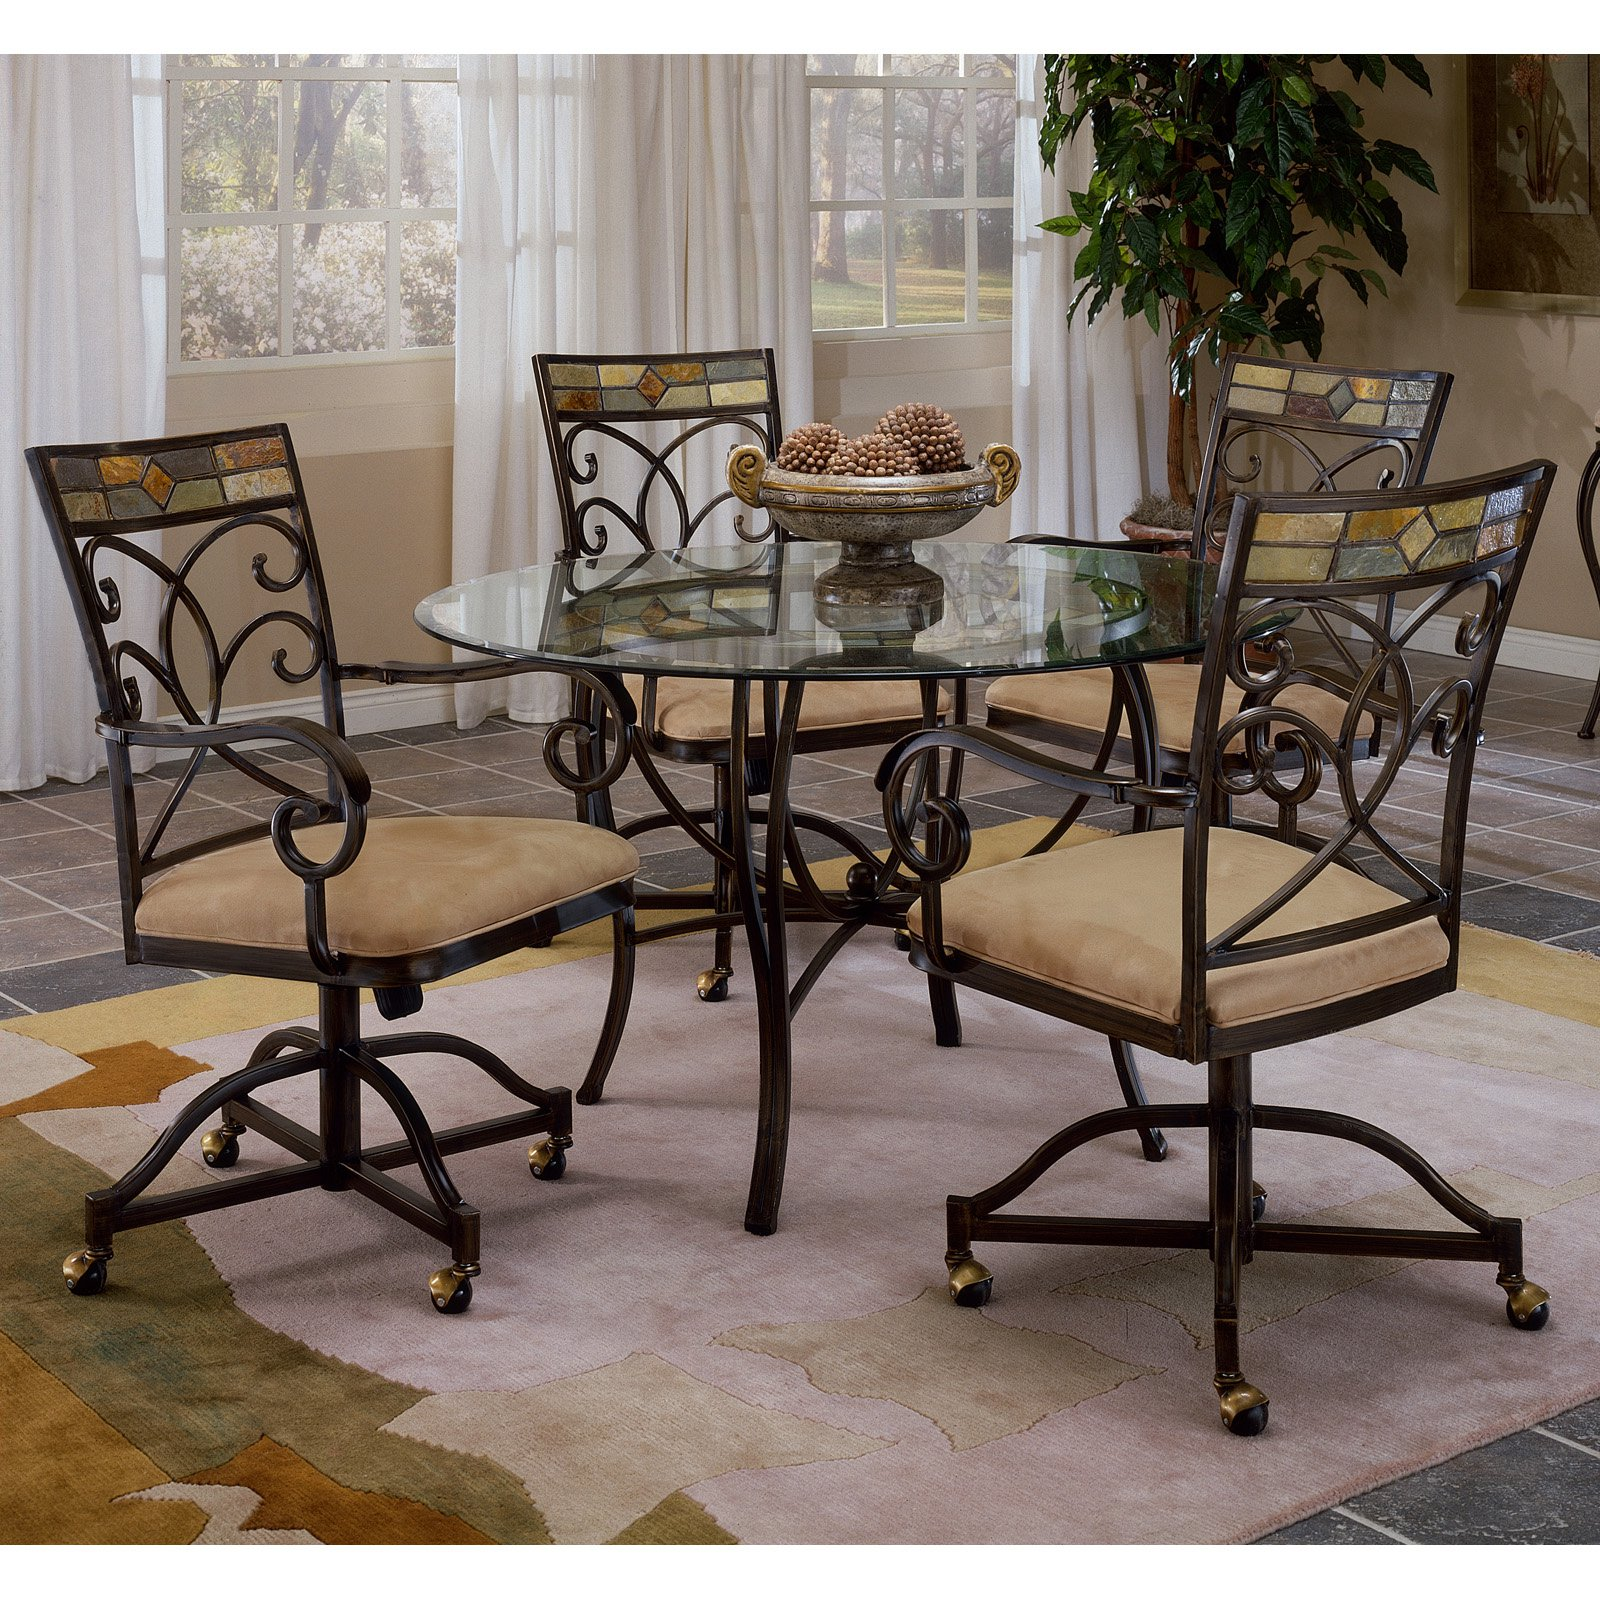 caster dining chairs ostrich beach hillsdsale pompeii chair set of 2 walmart com